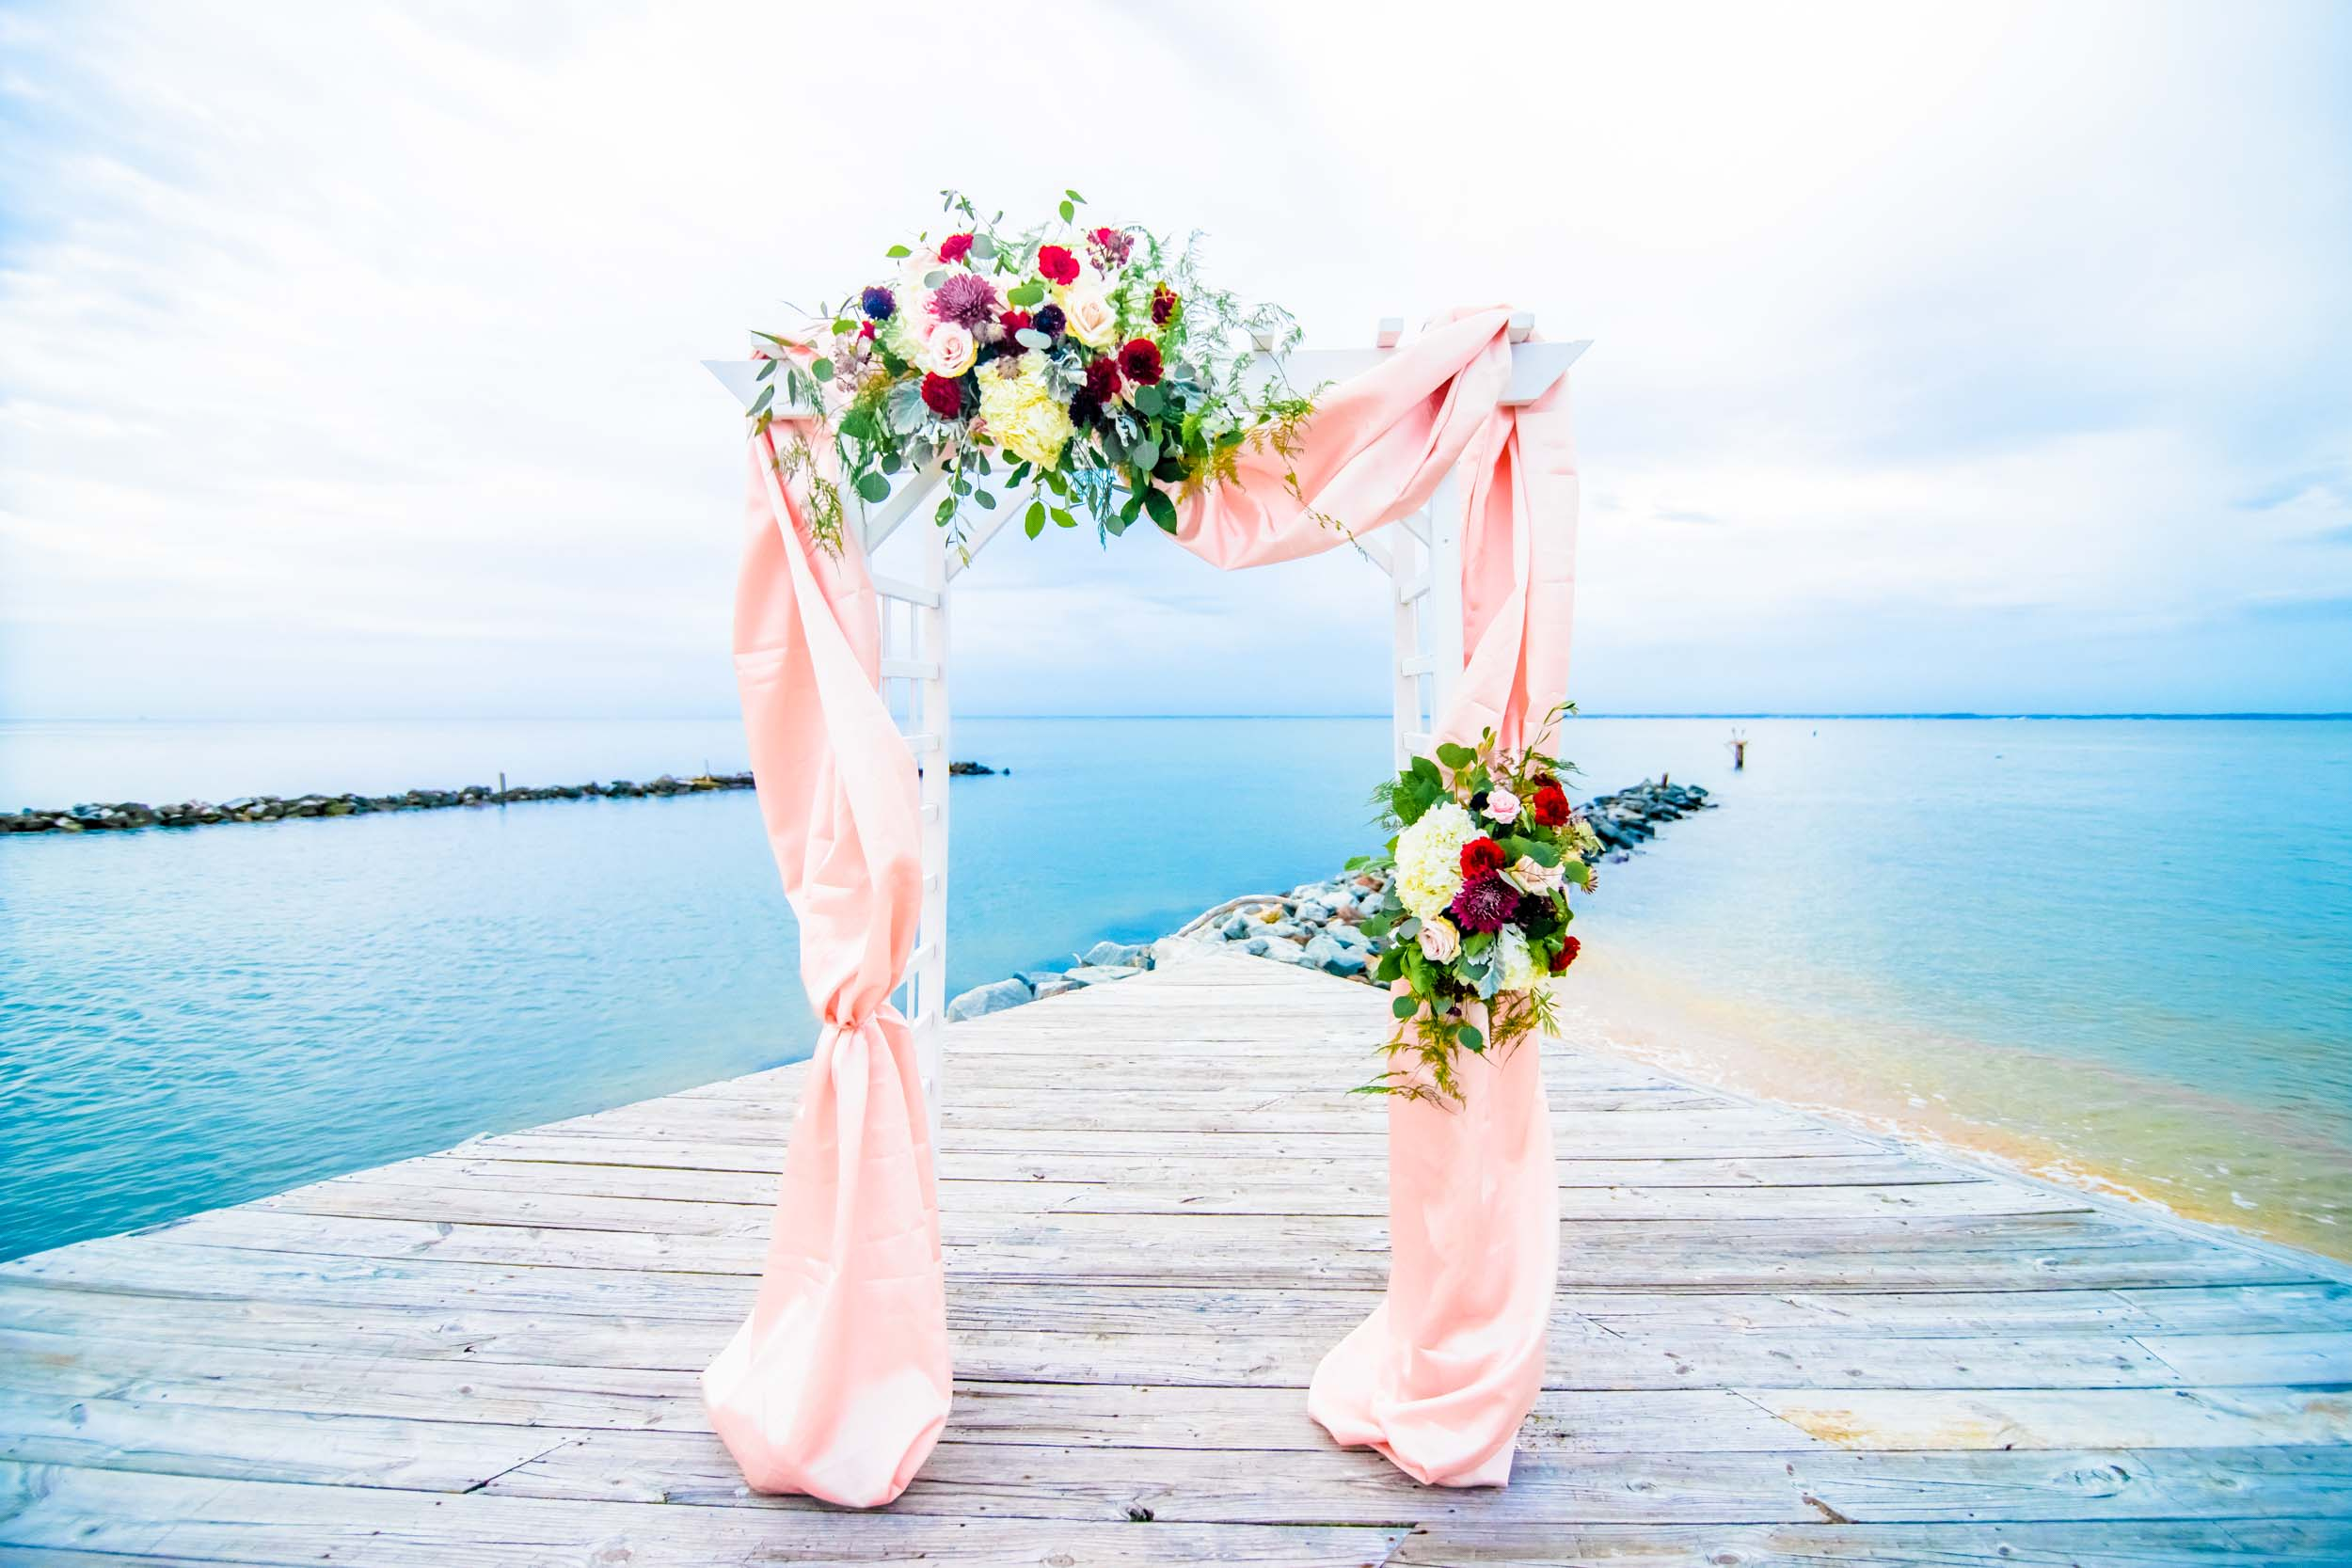 dc+metro+wedding+photographer+vadym+guliuk+photography+wedding+venue-2044.jpg